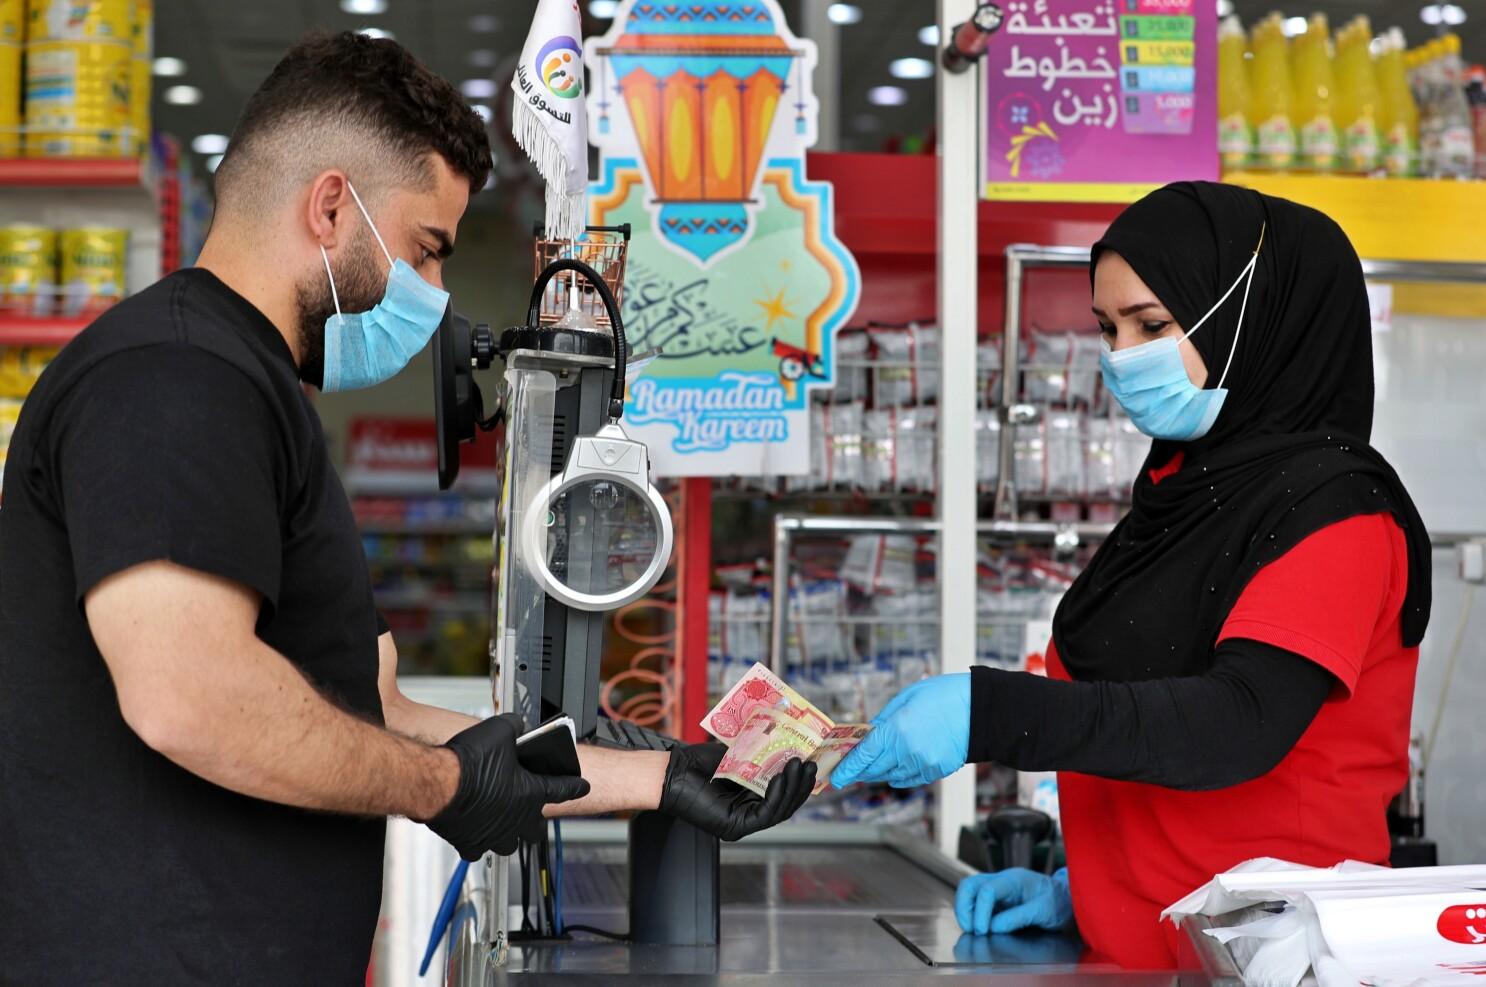 Coronavirus Has Spawned Suspicion Of Paper Money Los Angeles Times